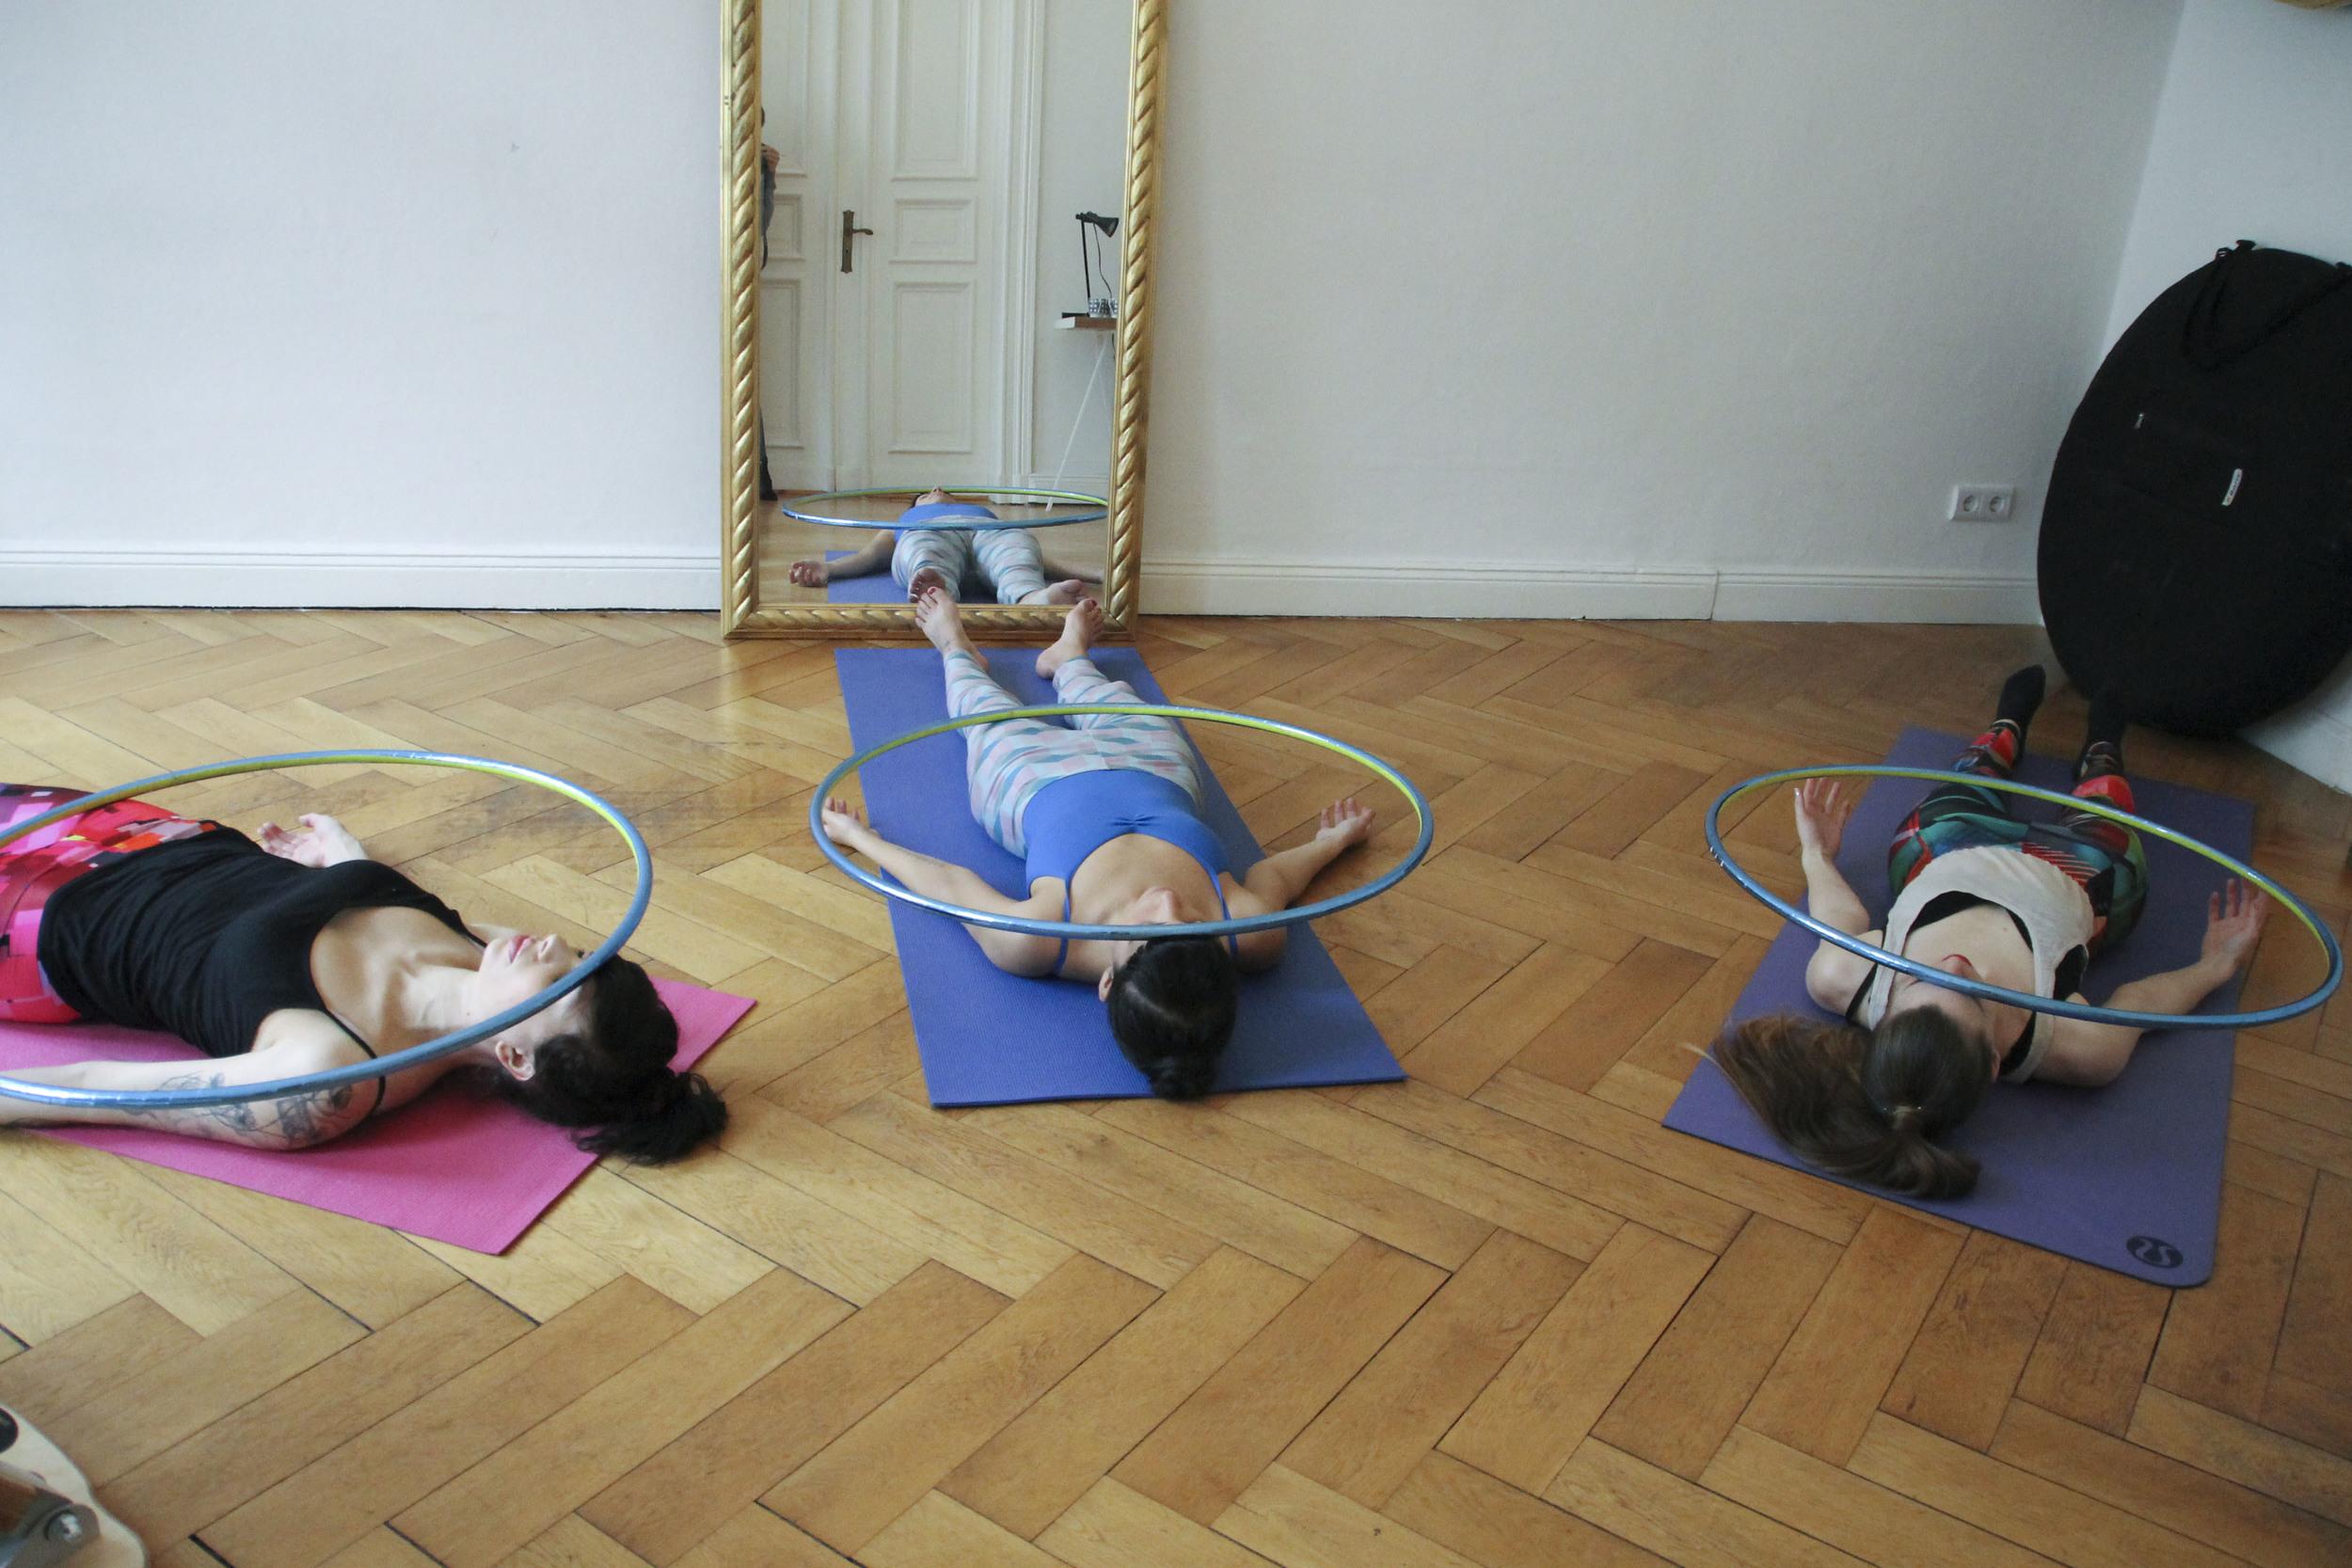 hoop yoga rebecca halls berlin1304.jpg